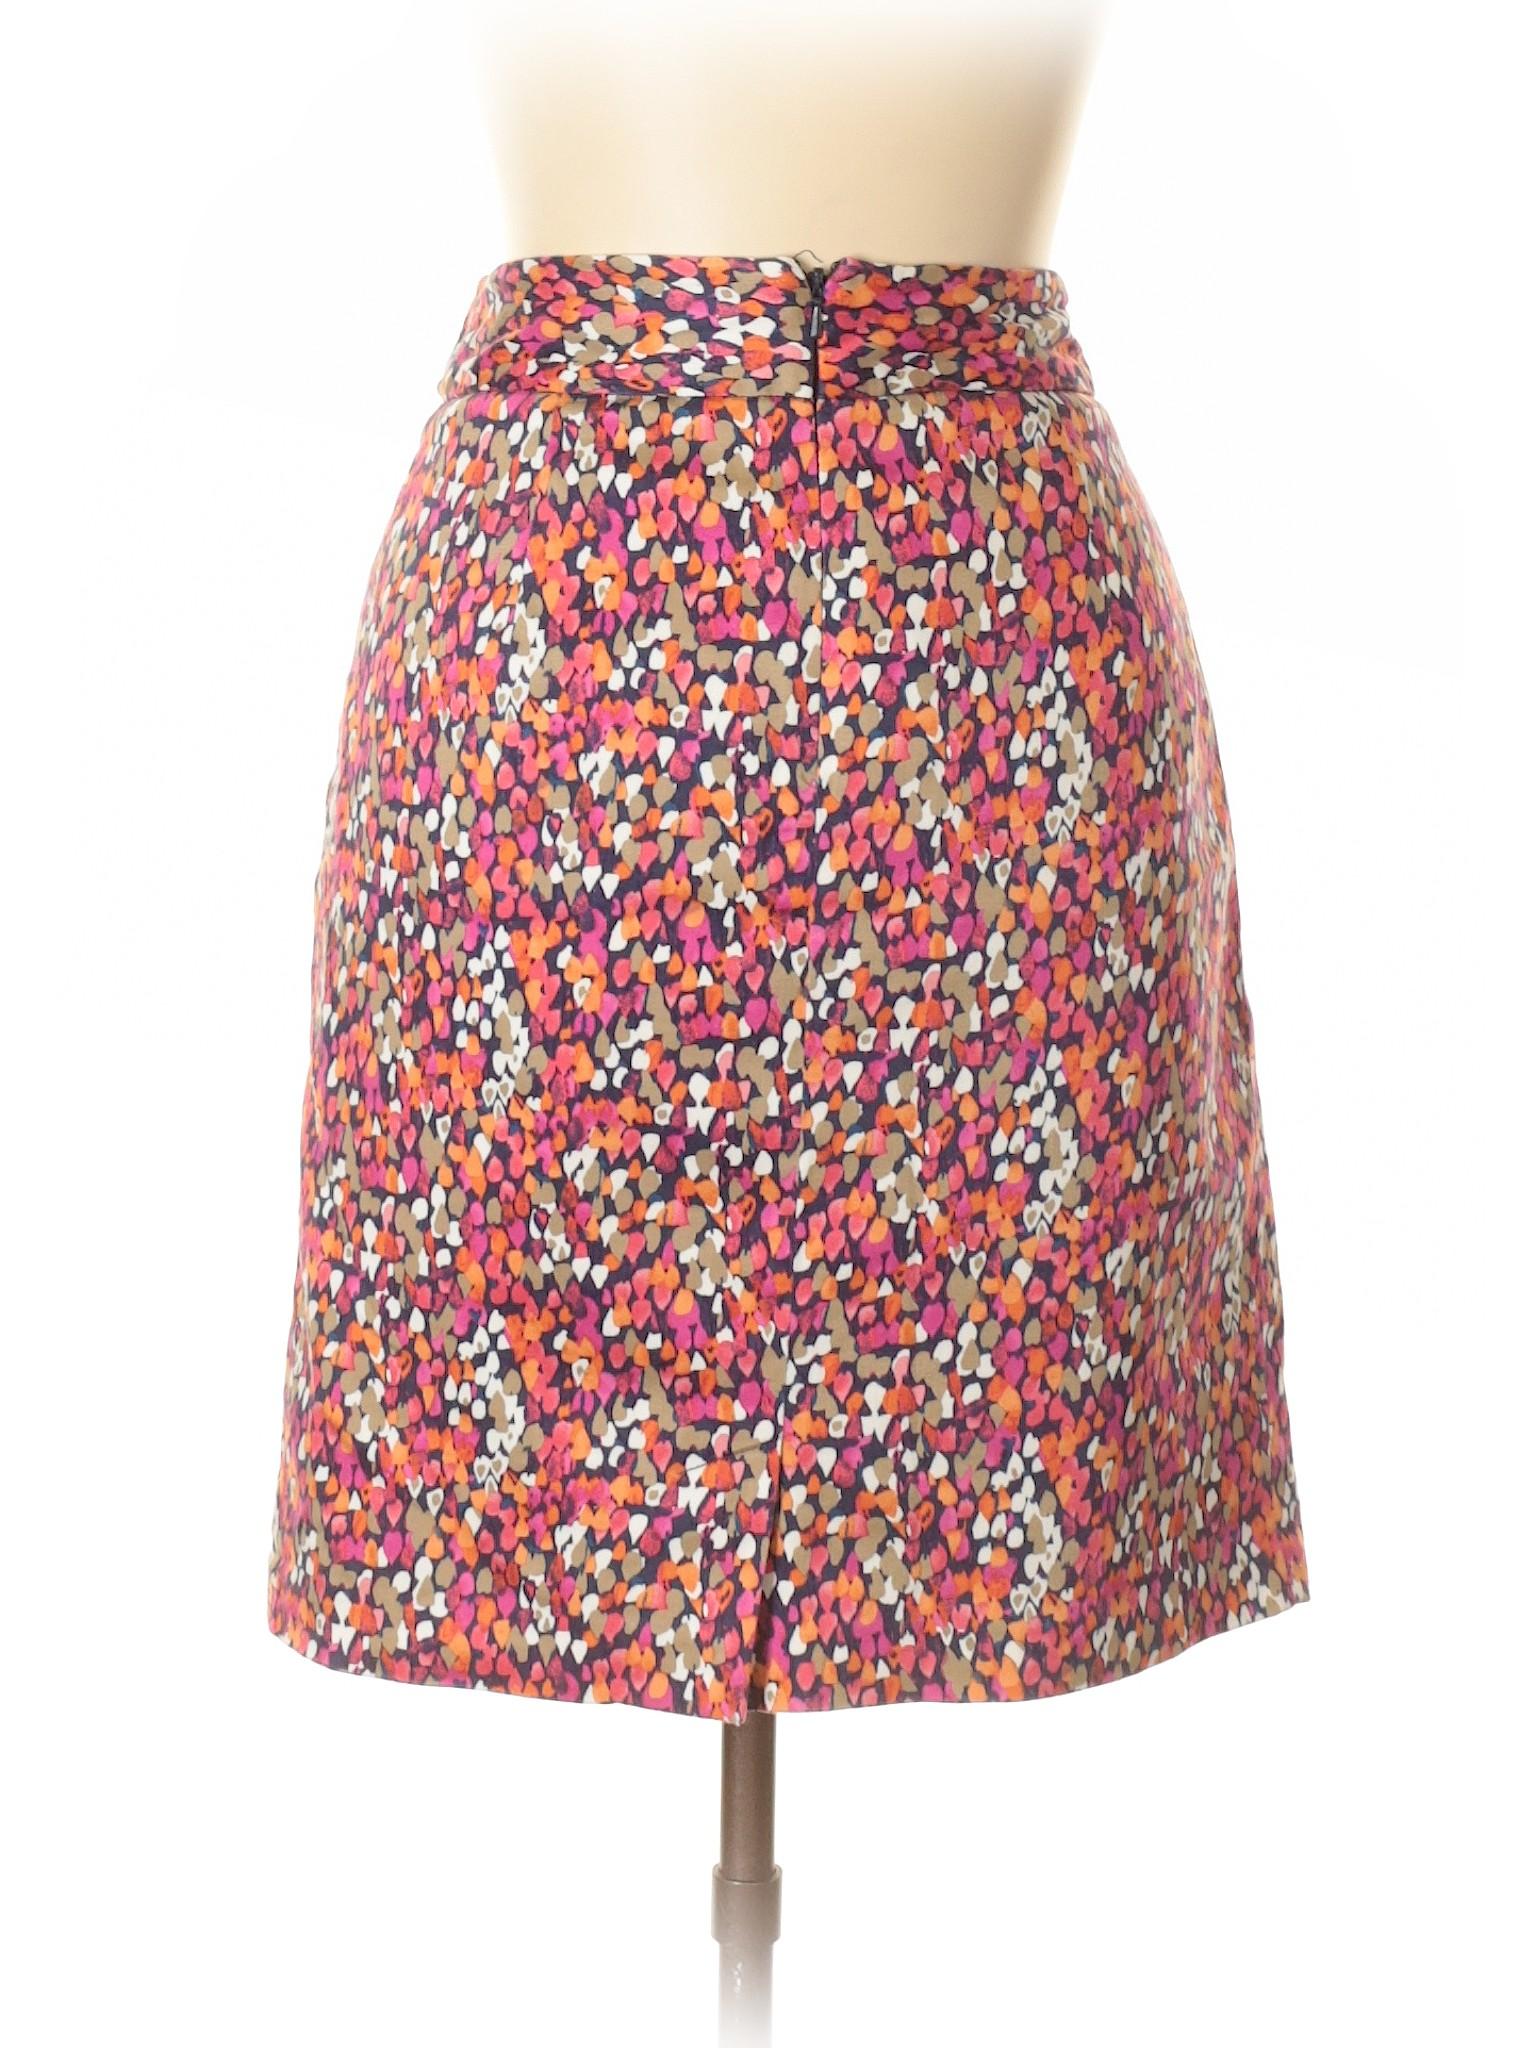 Boutique Skirt Casual Casual Casual Skirt Casual Skirt Skirt Boutique Skirt Boutique Boutique Casual Boutique Casual Boutique Skirt wAqwHF7